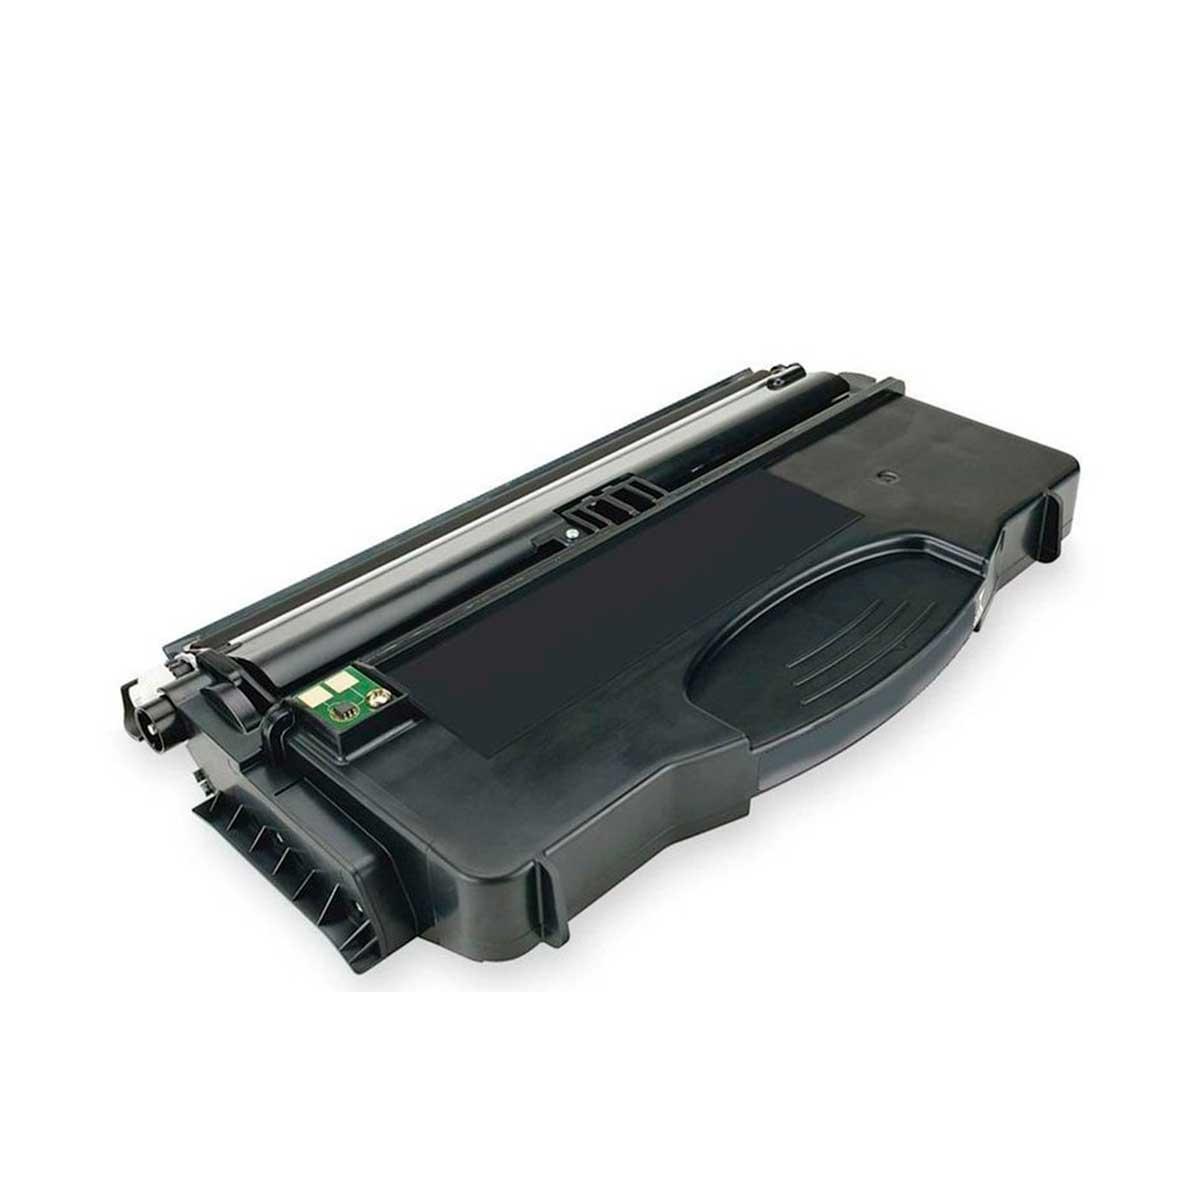 Toner Lexmark E120 E120N - Compativel